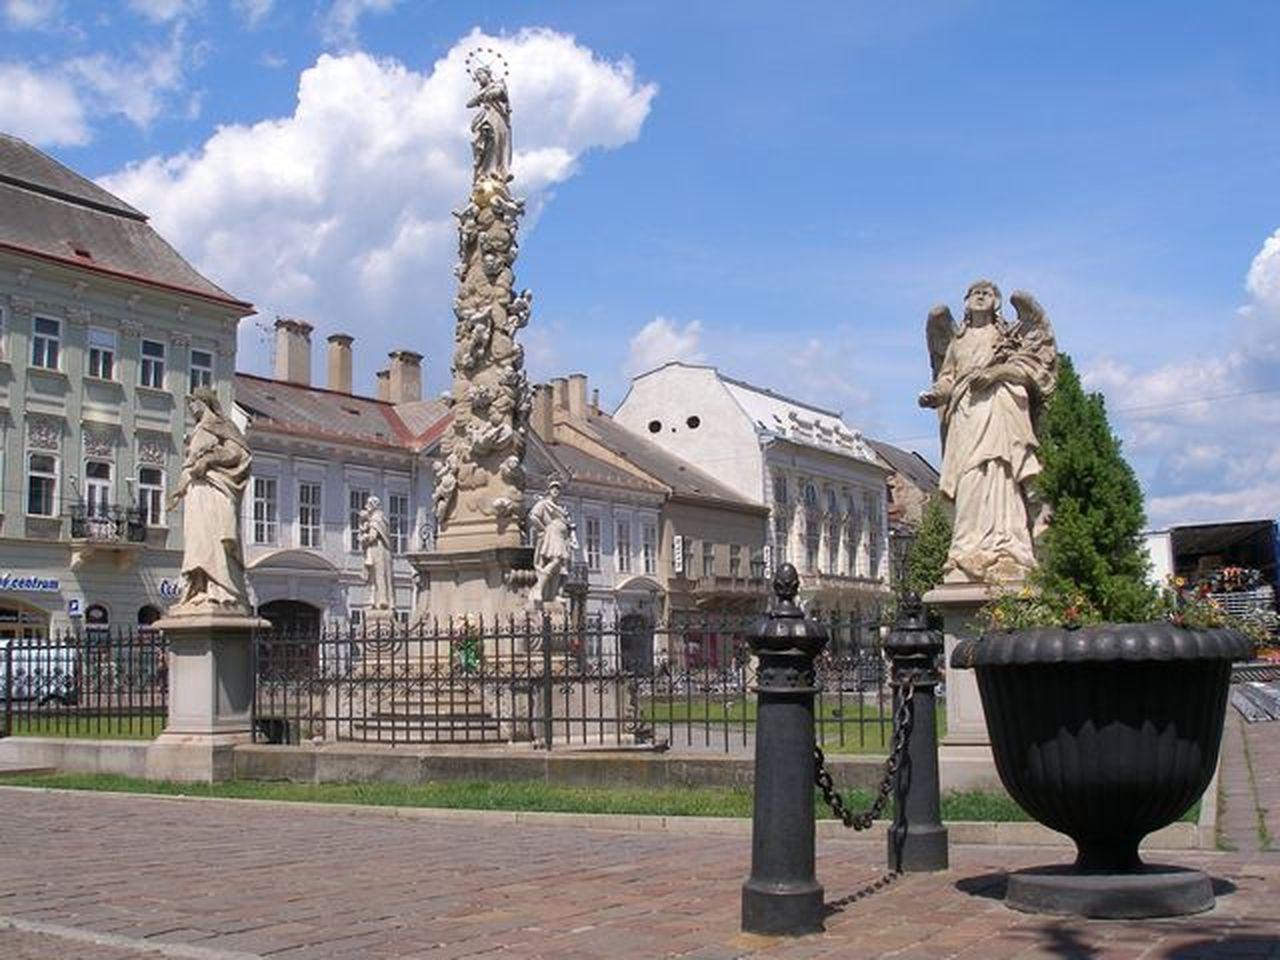 Kosice Slovakia  City pictures : Description Slovakia Kosice 24